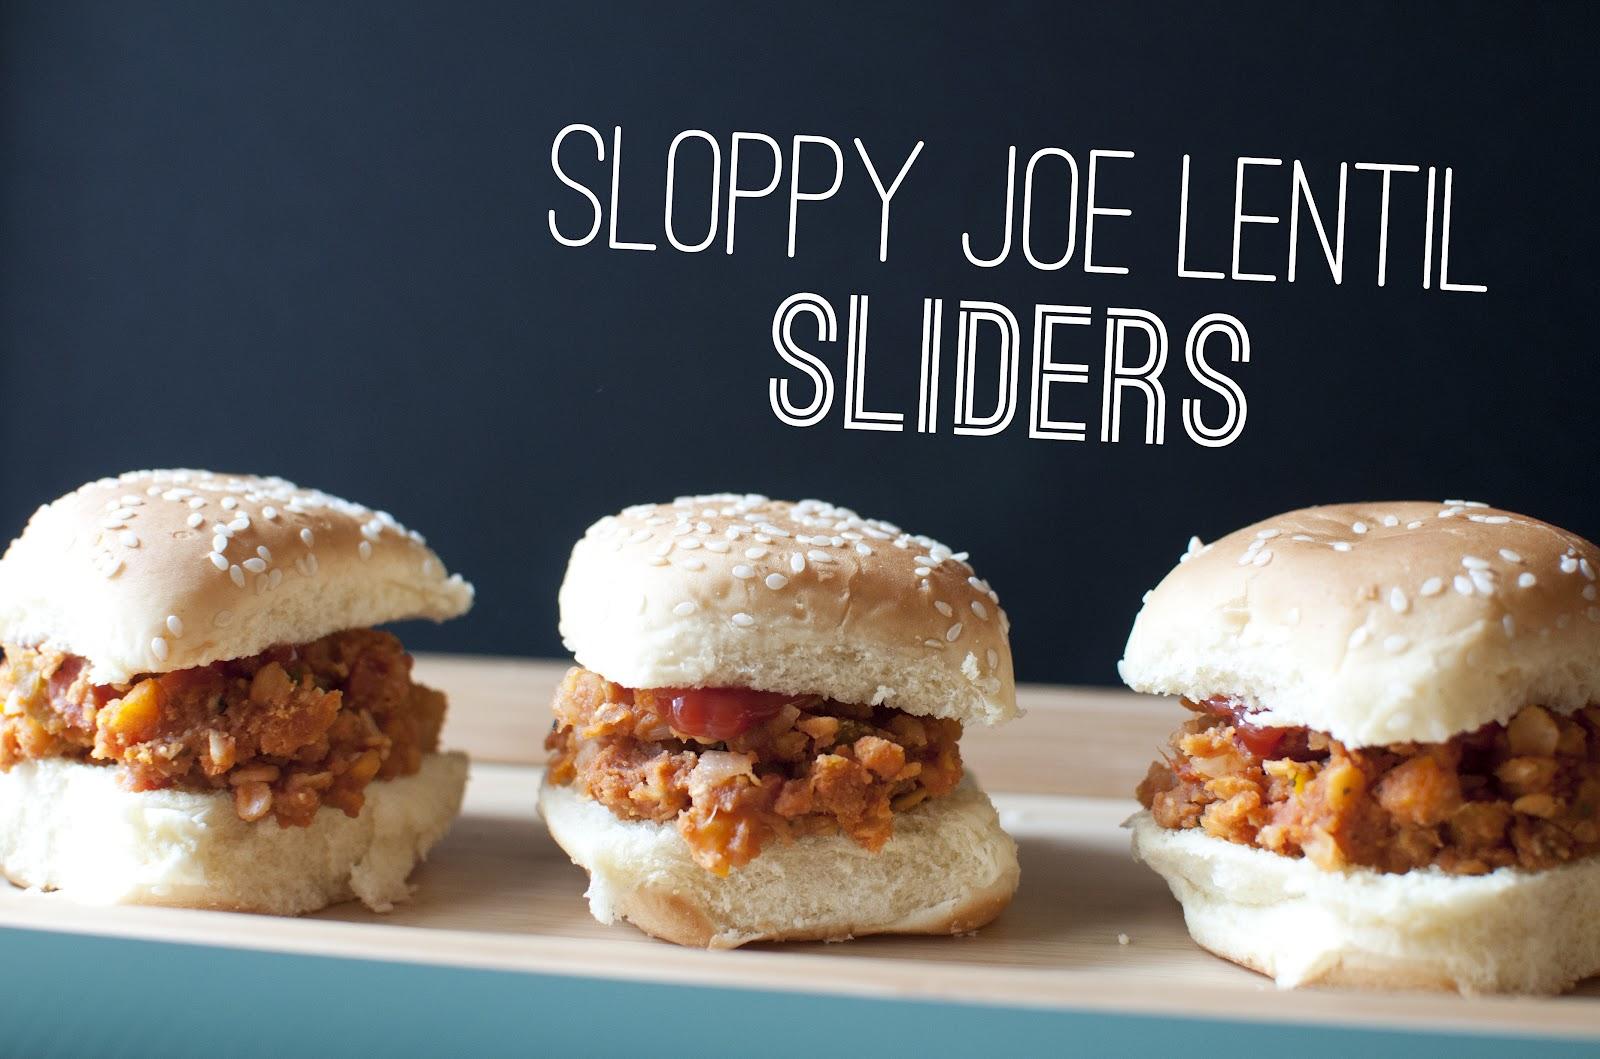 ... sloppy joe s sloppy joe s vegan red wine sloppy joe sliders recept